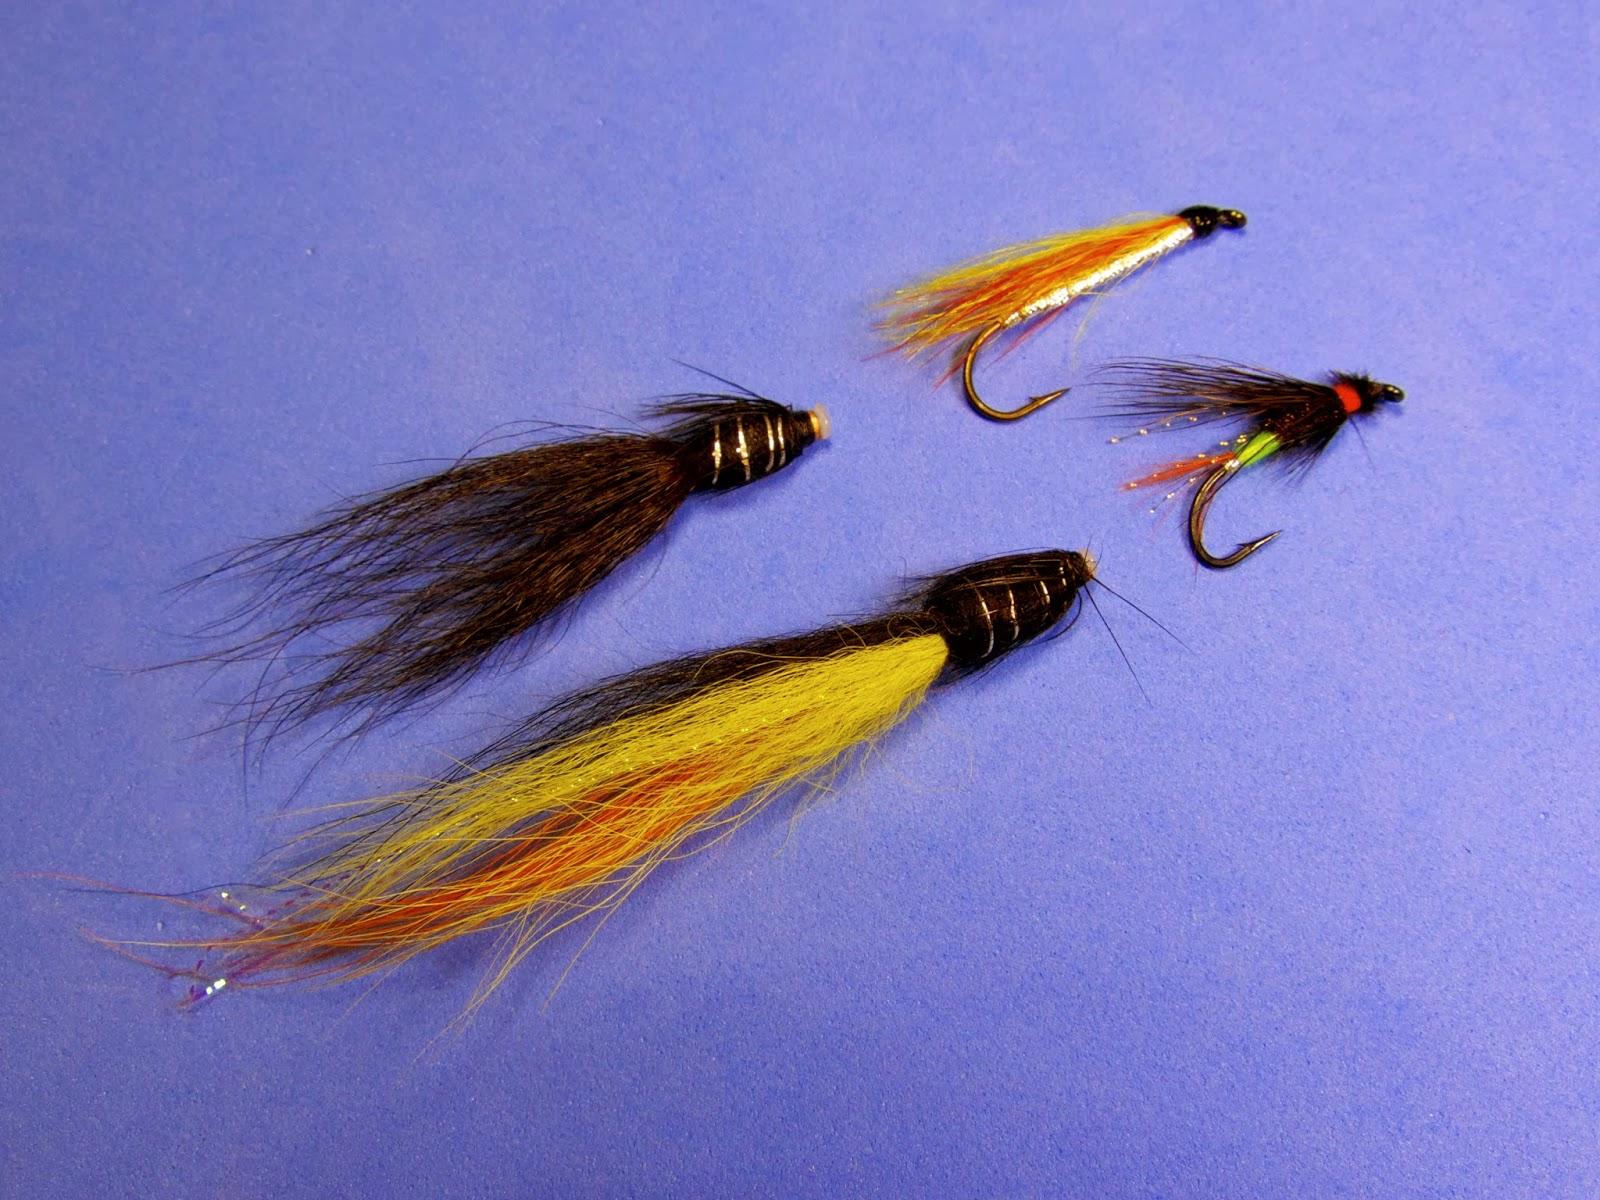 Atlantic salmon flies december 2013 for Salon fly